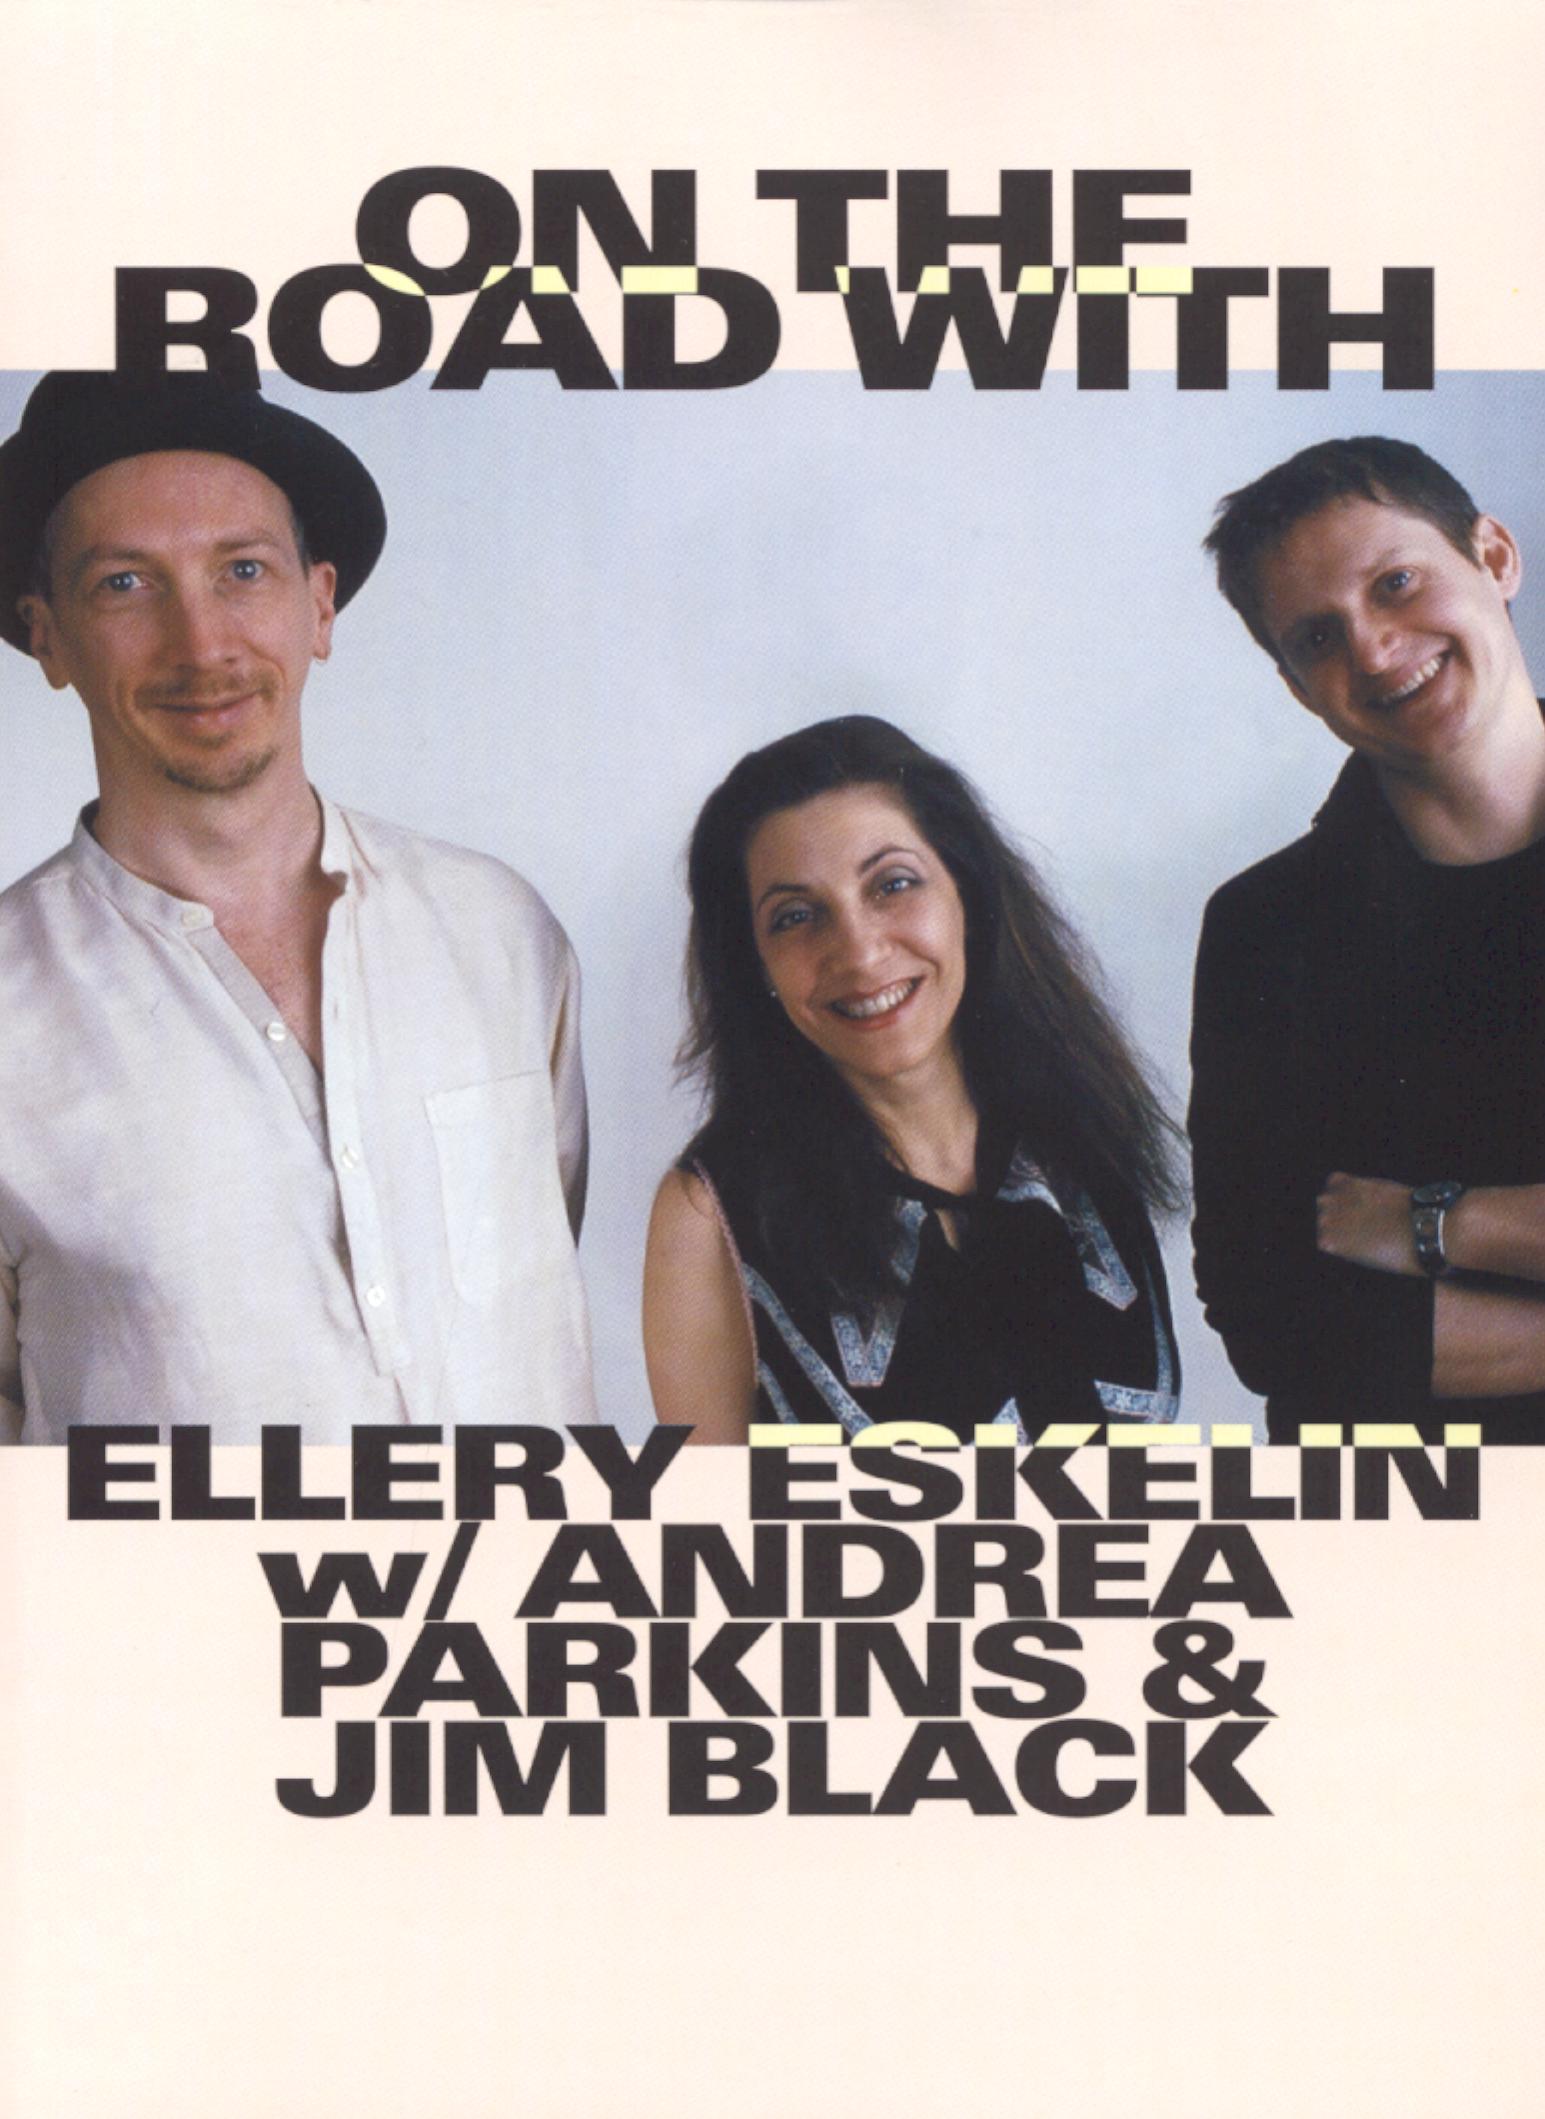 On the Road With Ellery Eskelin w/Andrea Parkins & Jim Black